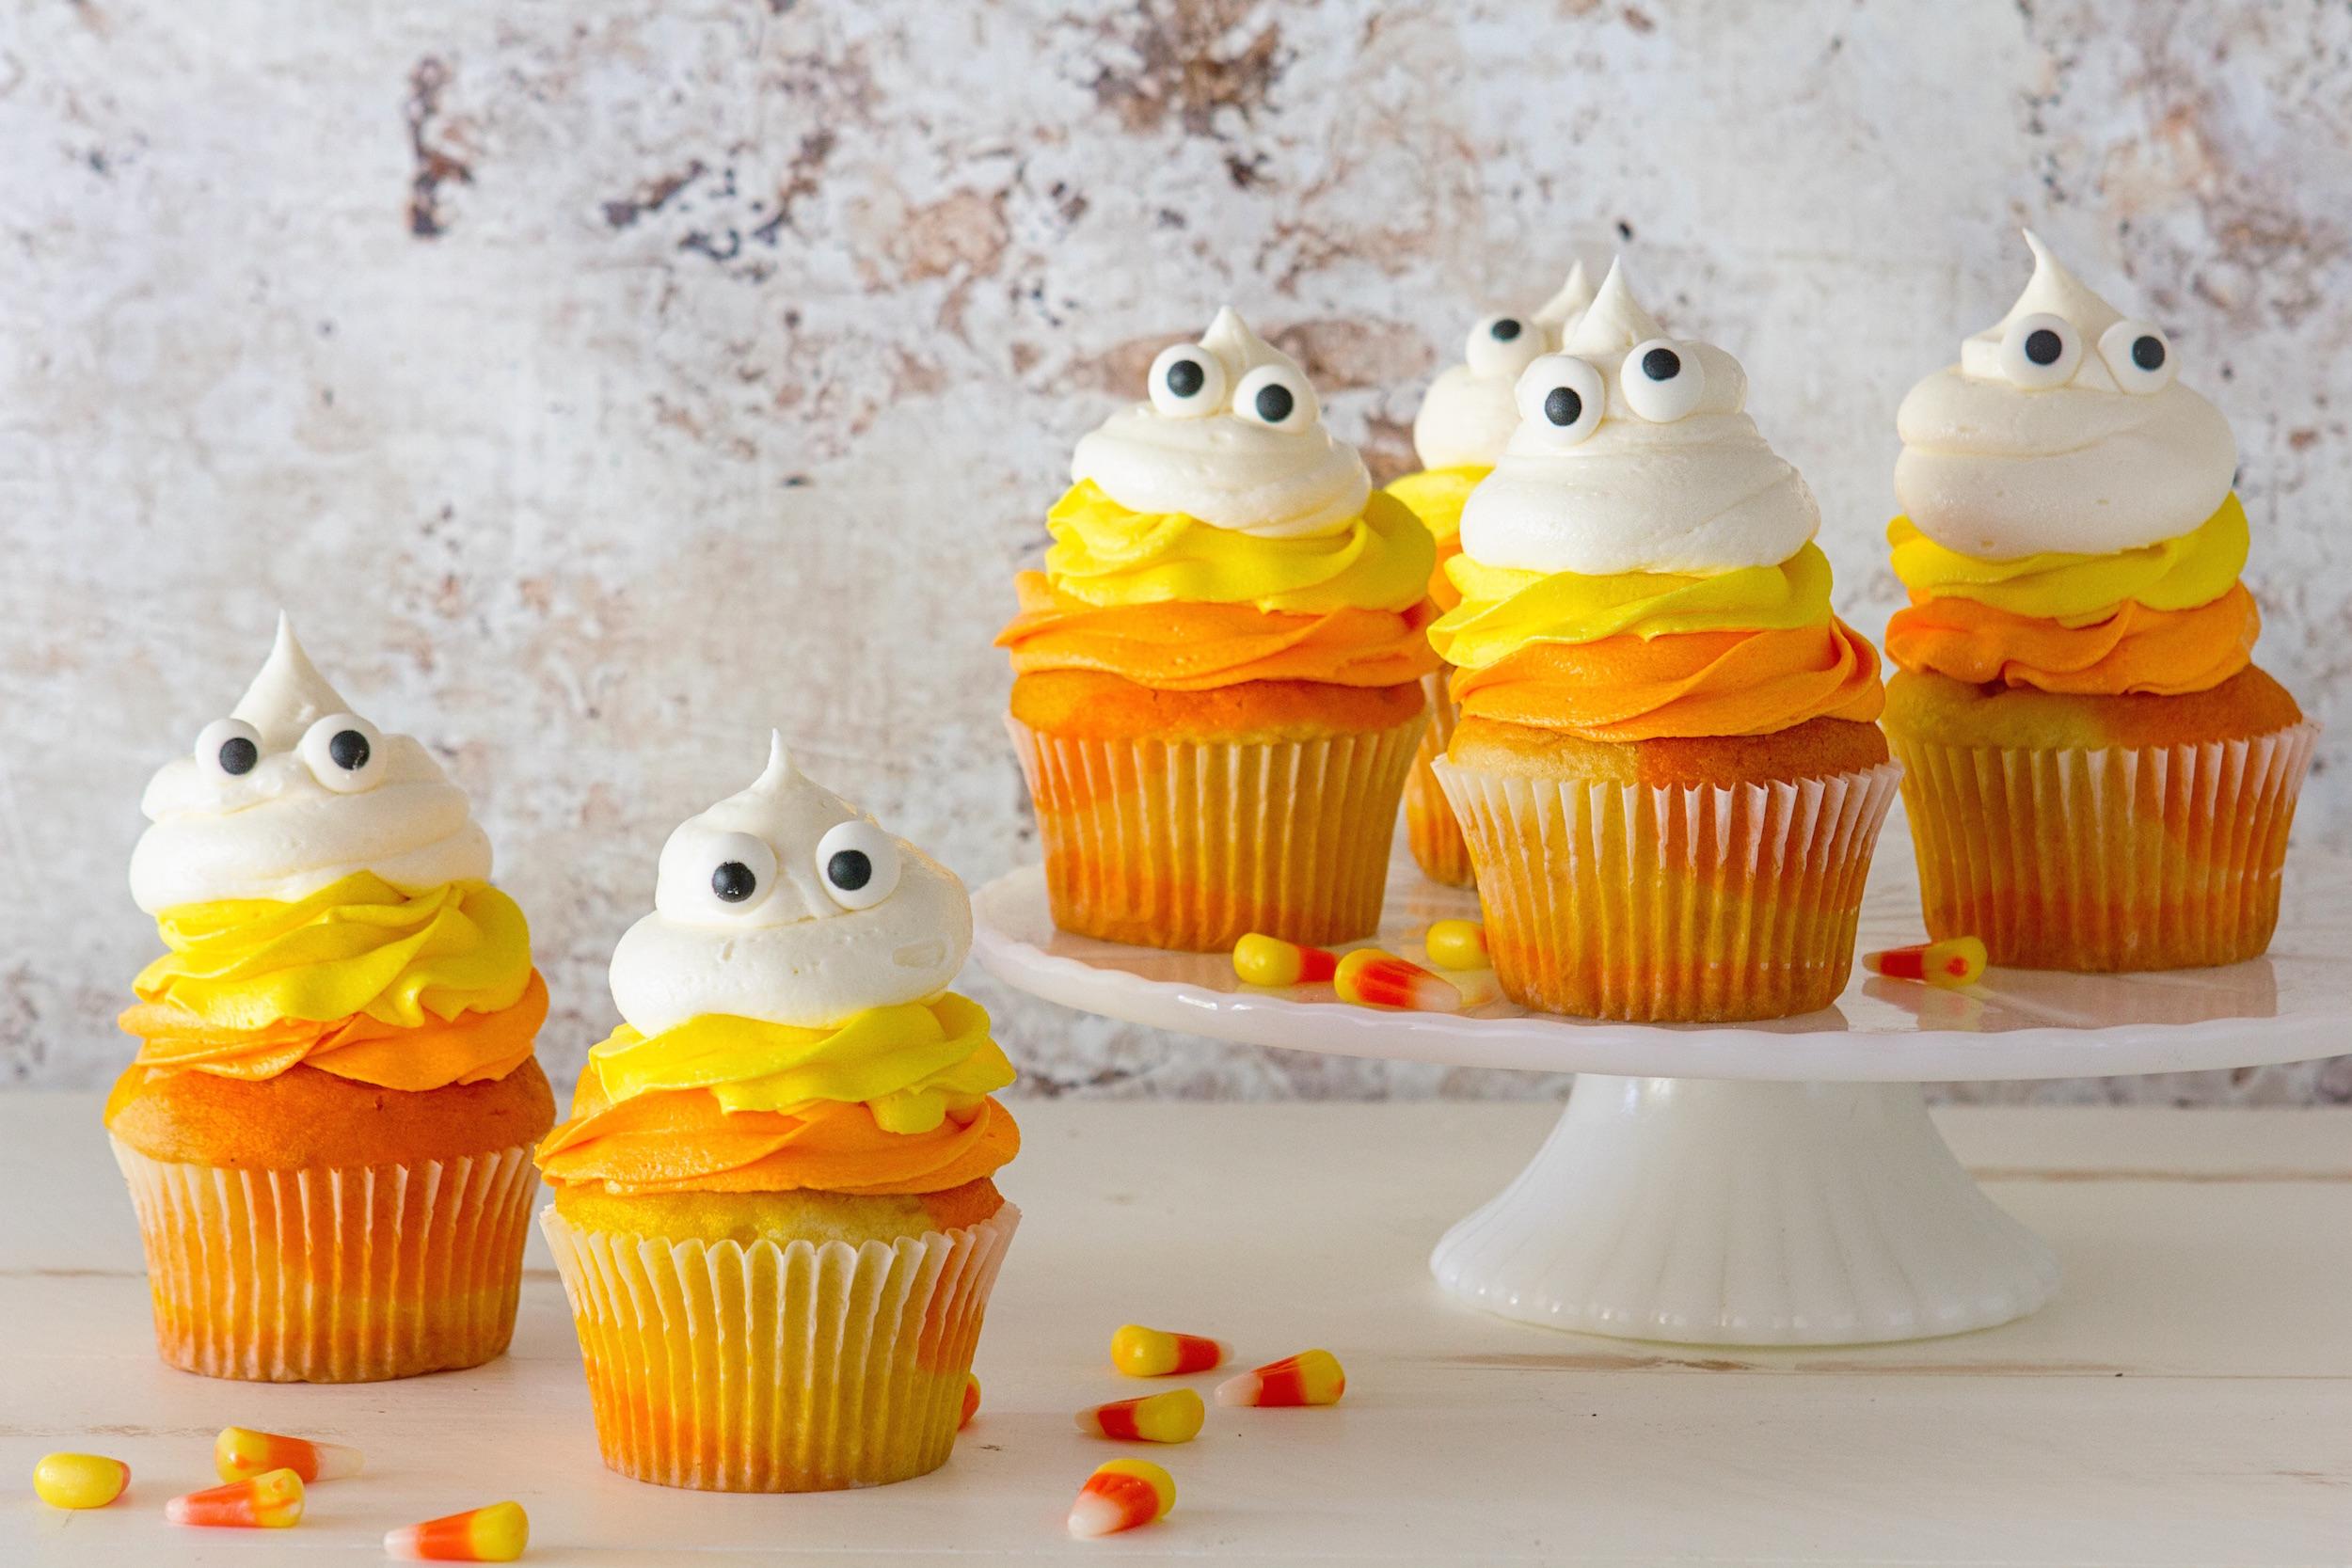 18 Easy Halloween Cupcake Ideas Recipes Amp Decorating